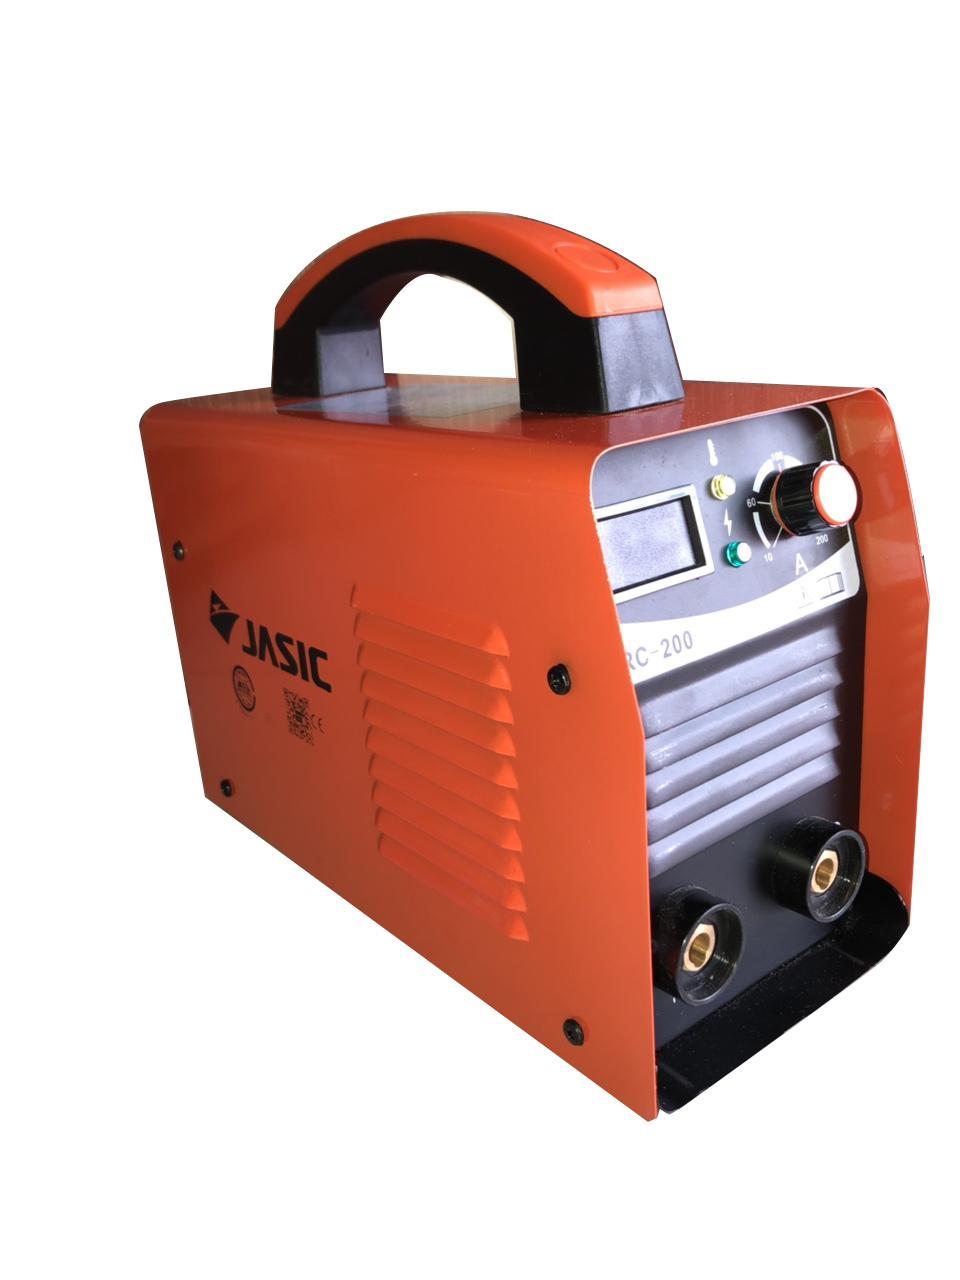 JASIC ARC-200 MINI